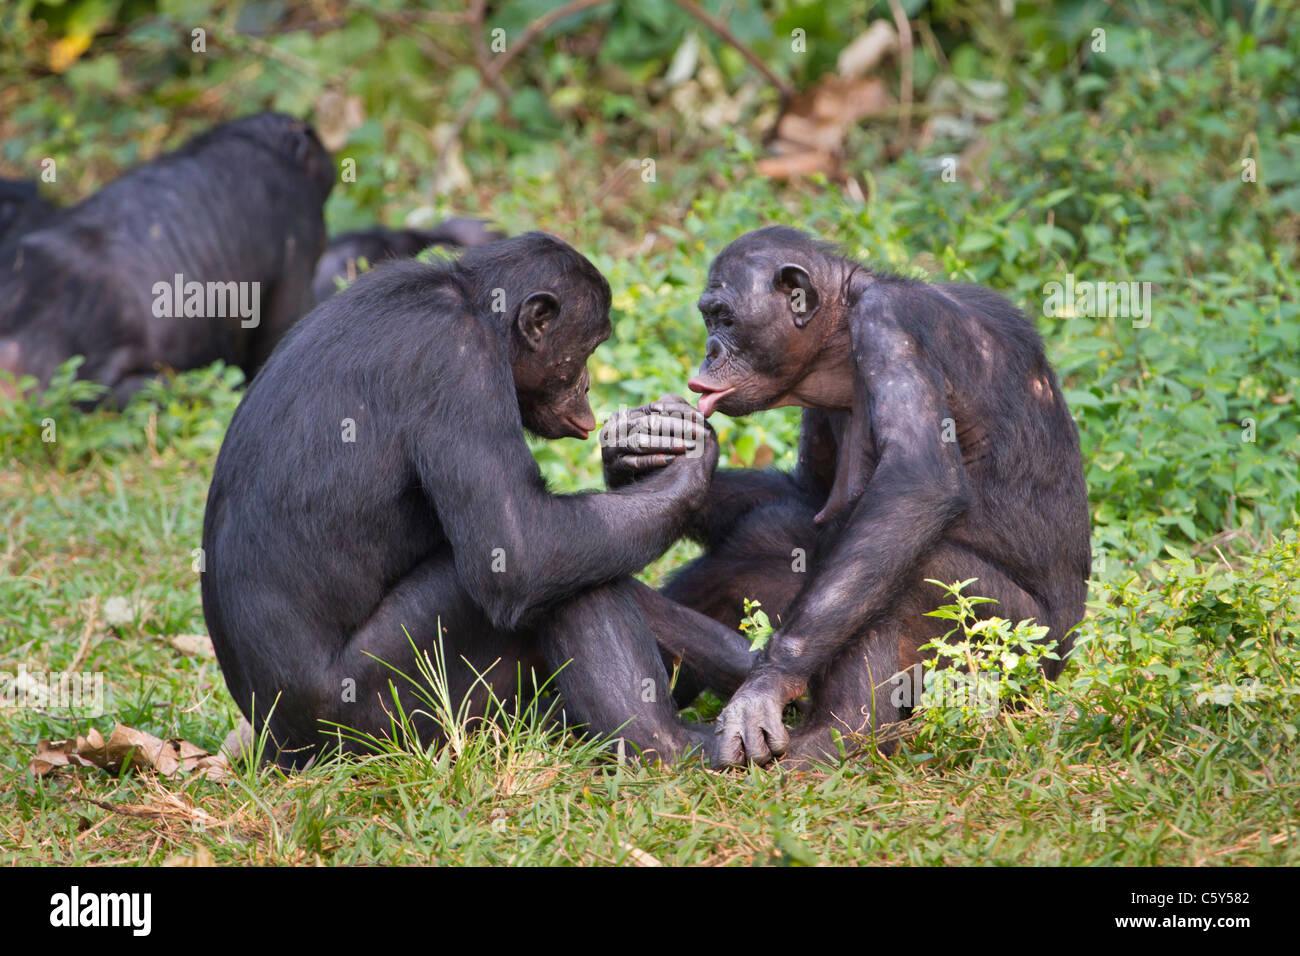 Bonobo (Pan paniscus) doing hand wrestling, D.R. Congo. - Stock Image